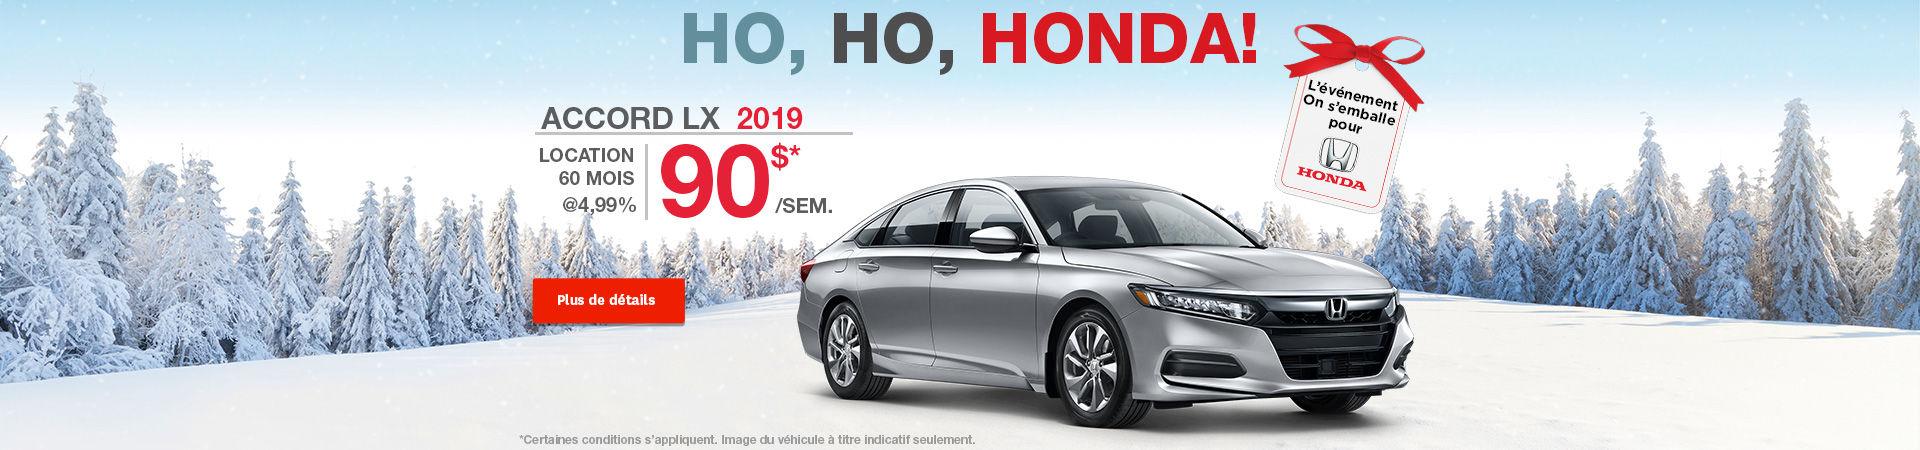 Honda  Accord - Headers